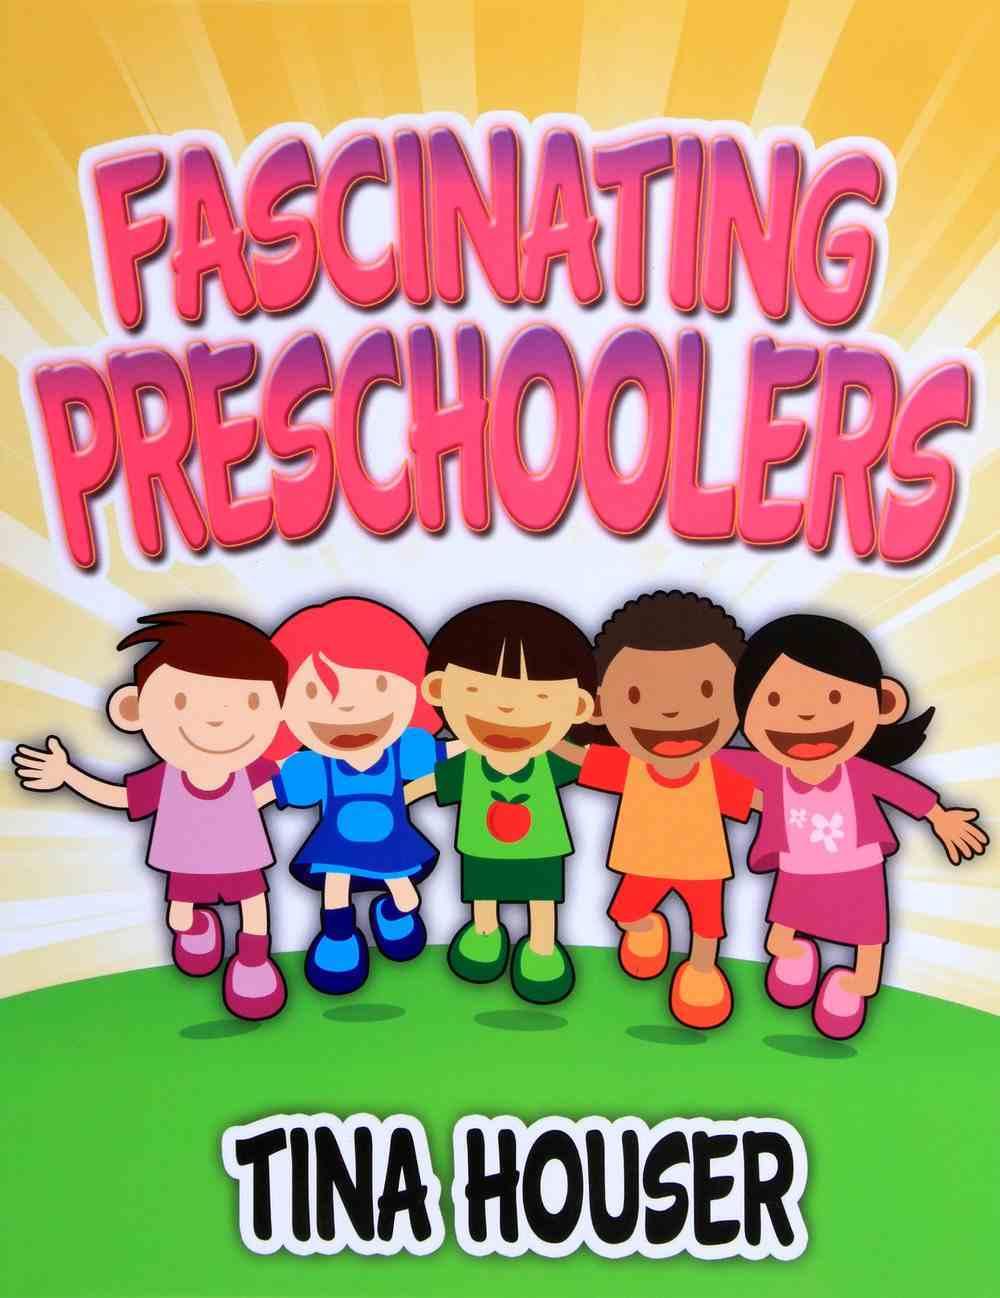 Fascinating Pre-Schoolers Paperback